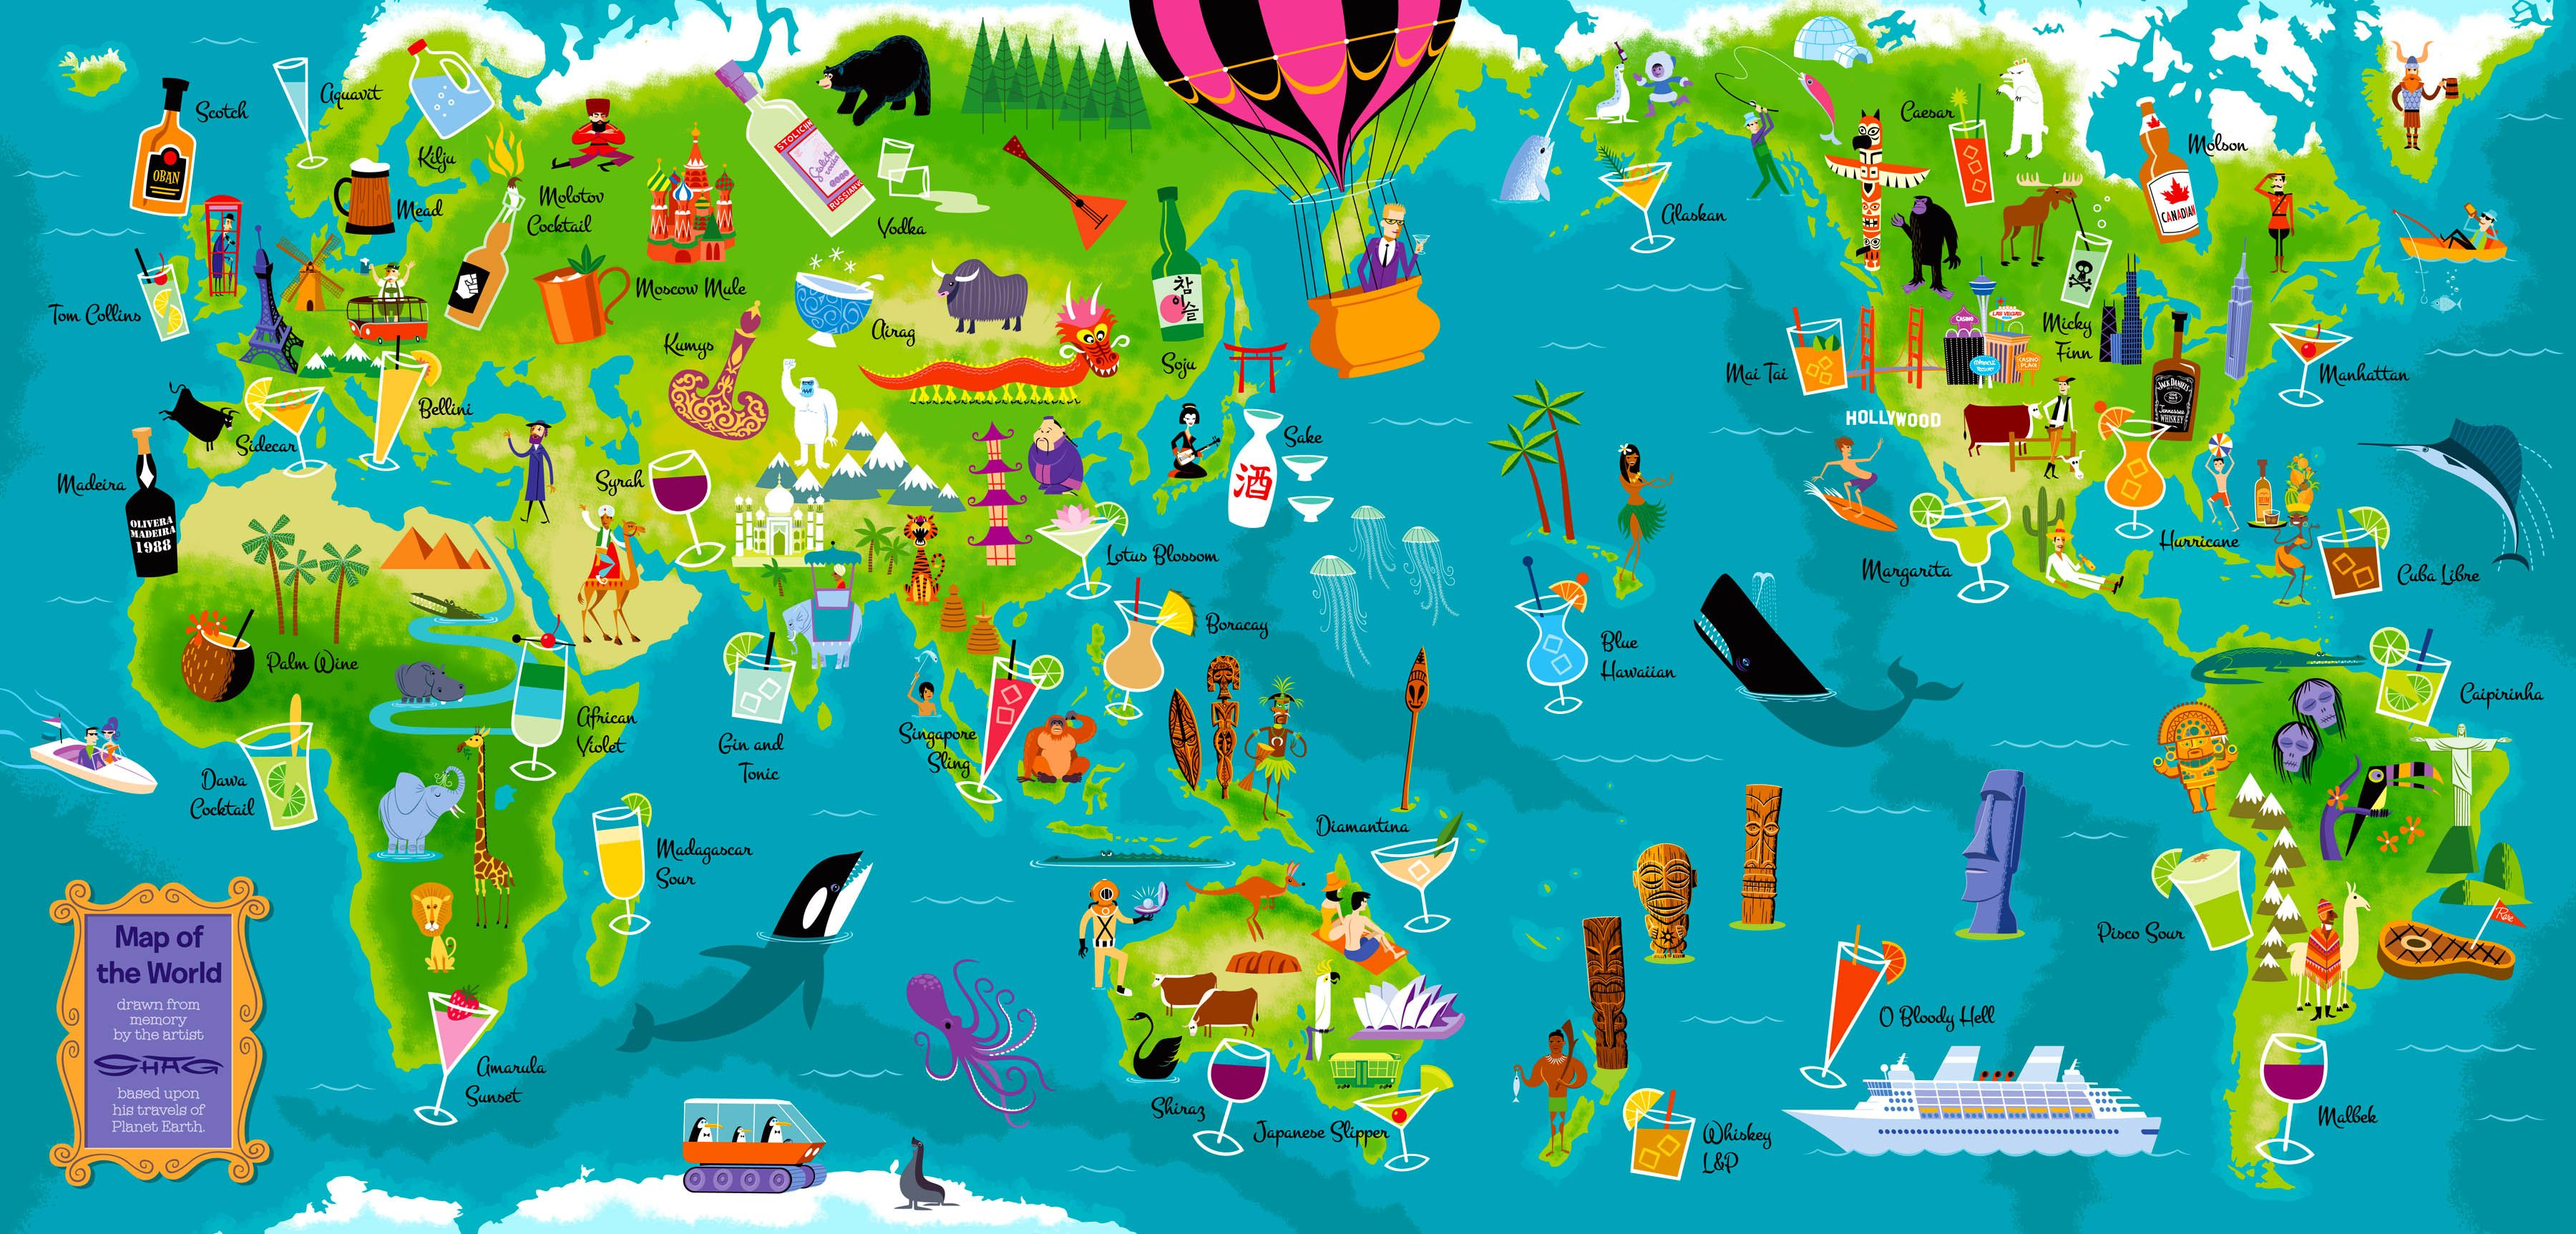 Shag large map shag pinterest retro art artsy fartsy and artist shag art map of the world gumiabroncs Images